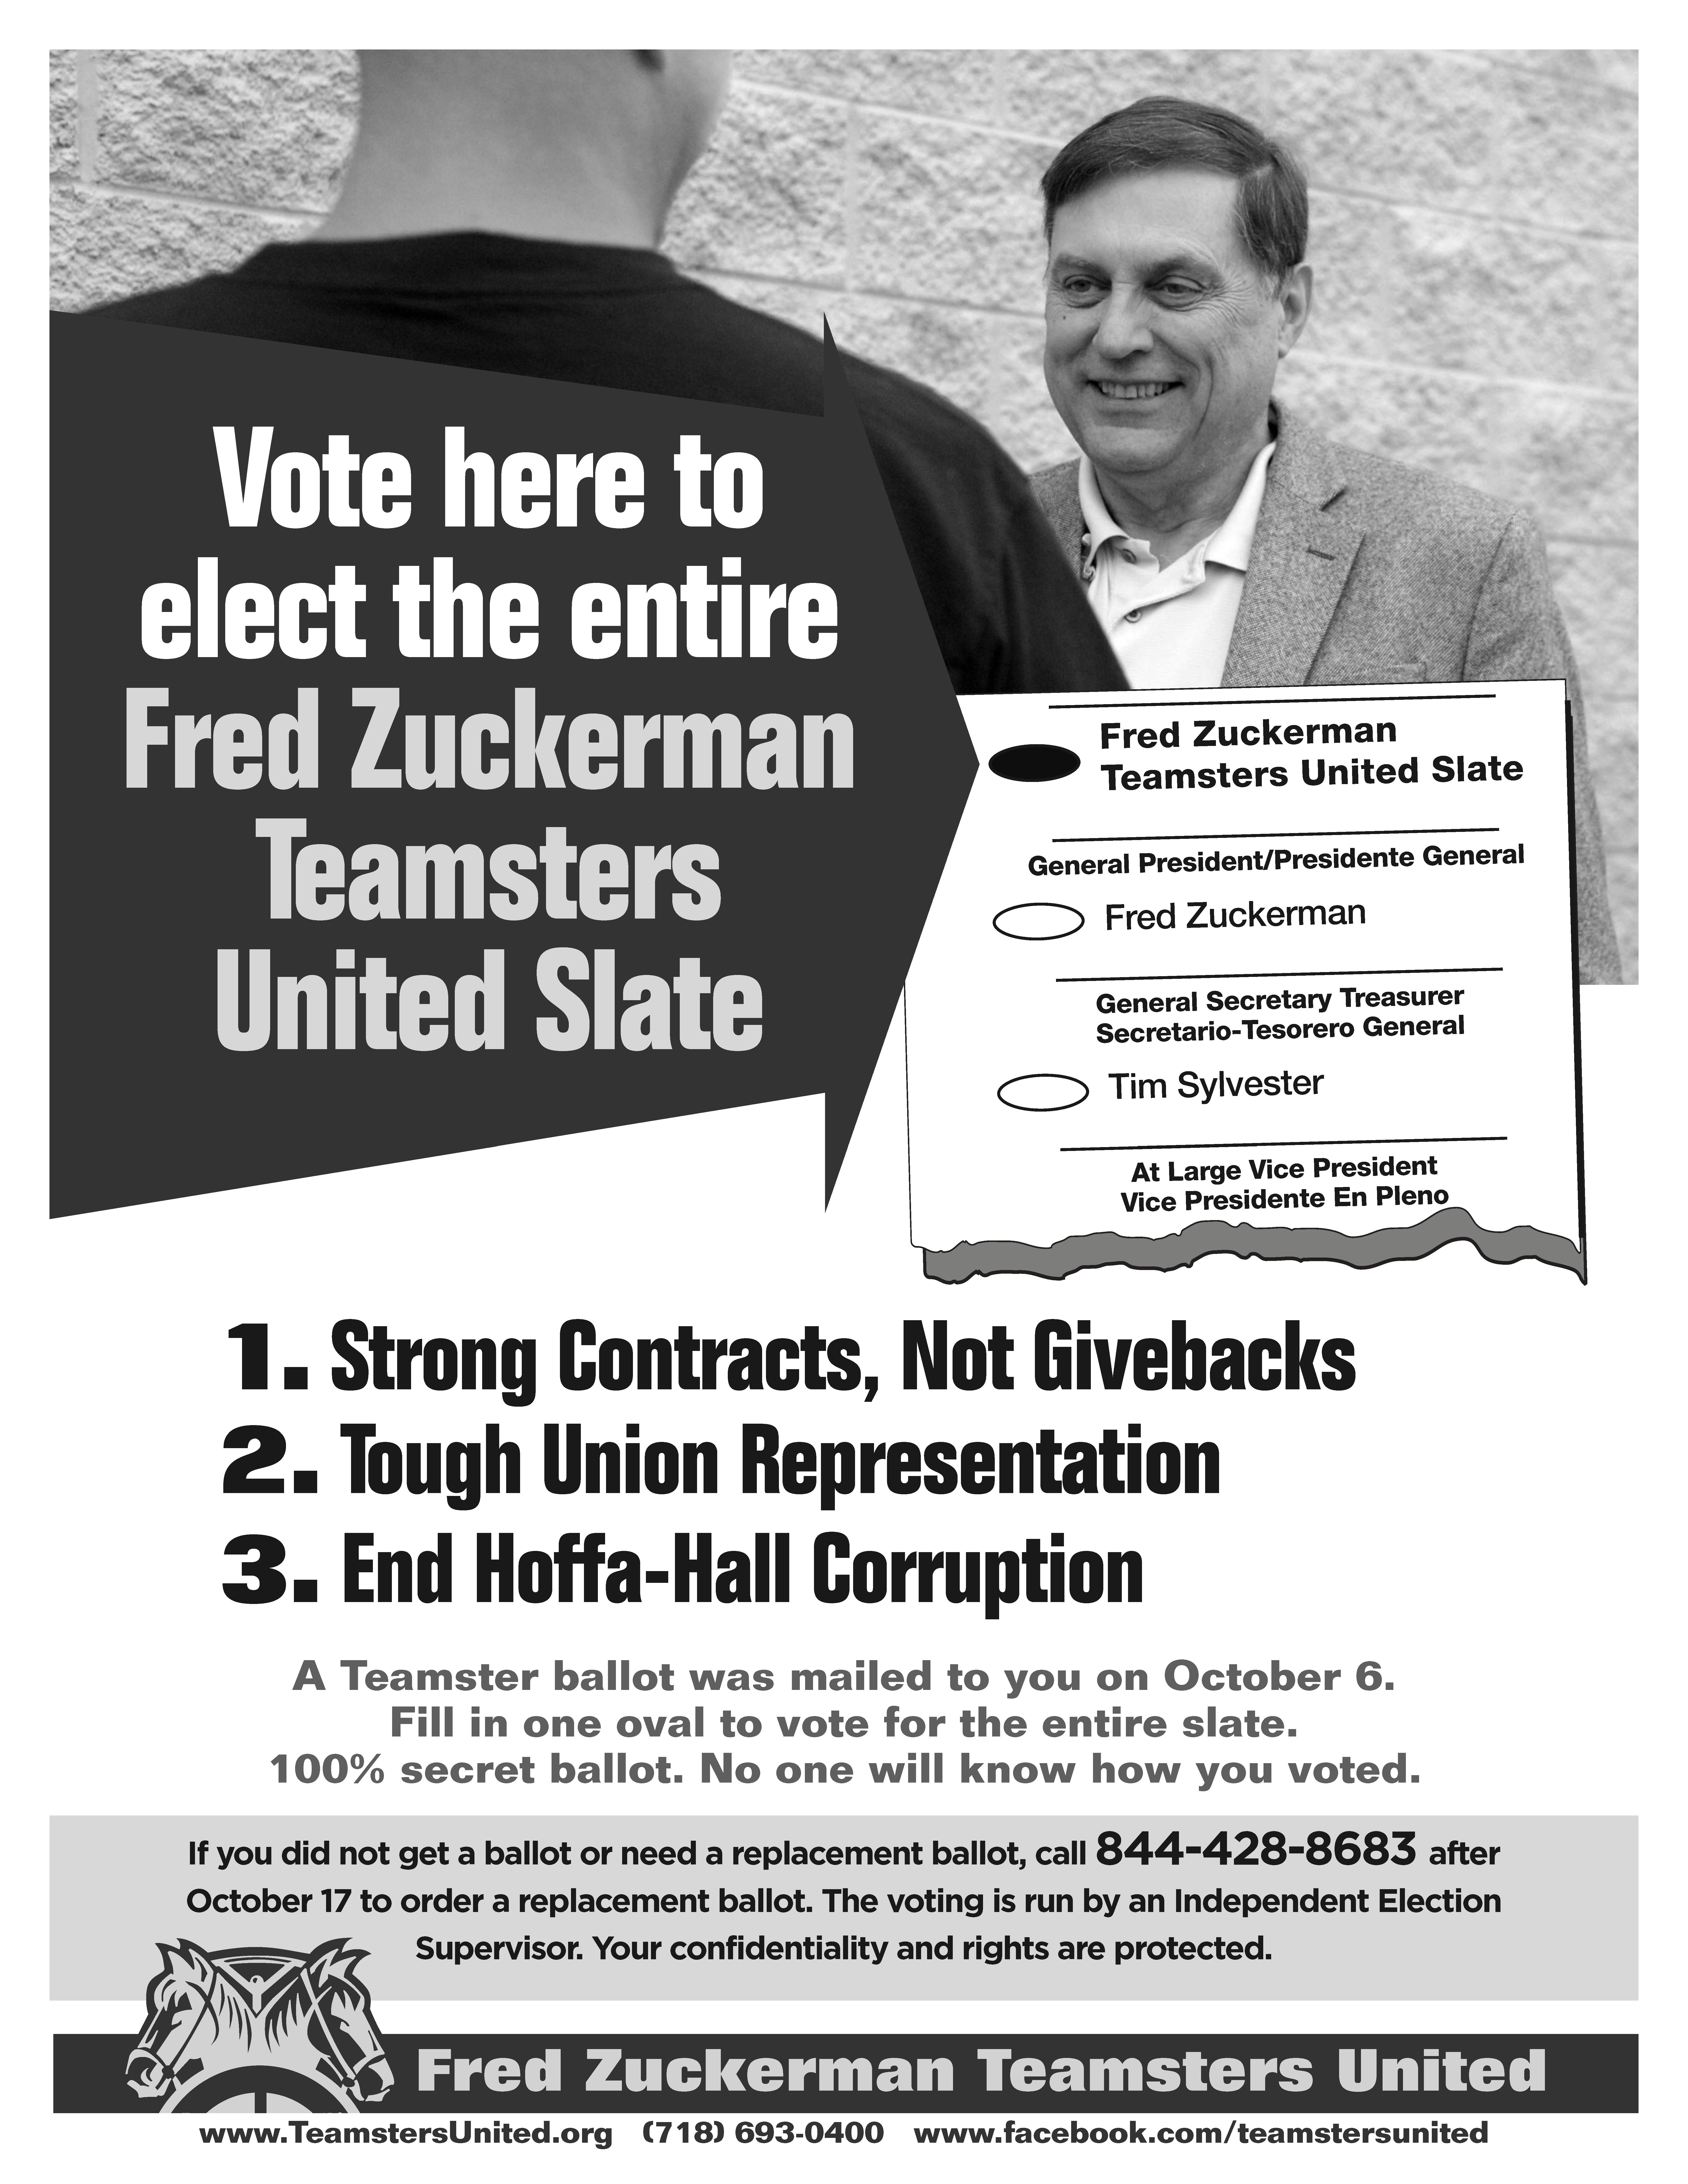 sample_ballot_flyer_10-10-16-g.png